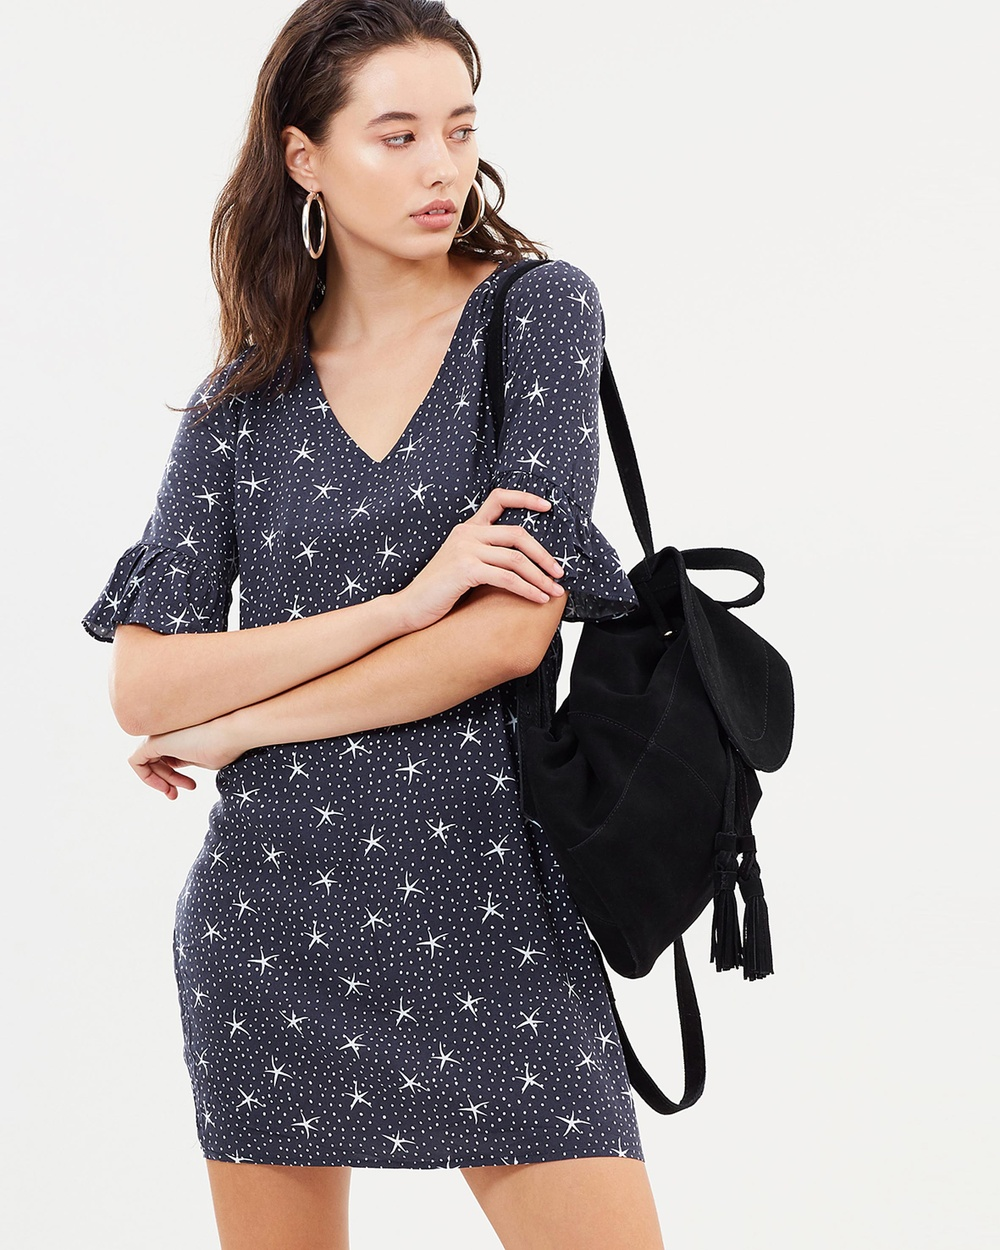 Dazie Starry Night Frill Dress Printed Dresses Navy Base Star Starry Night Frill Dress